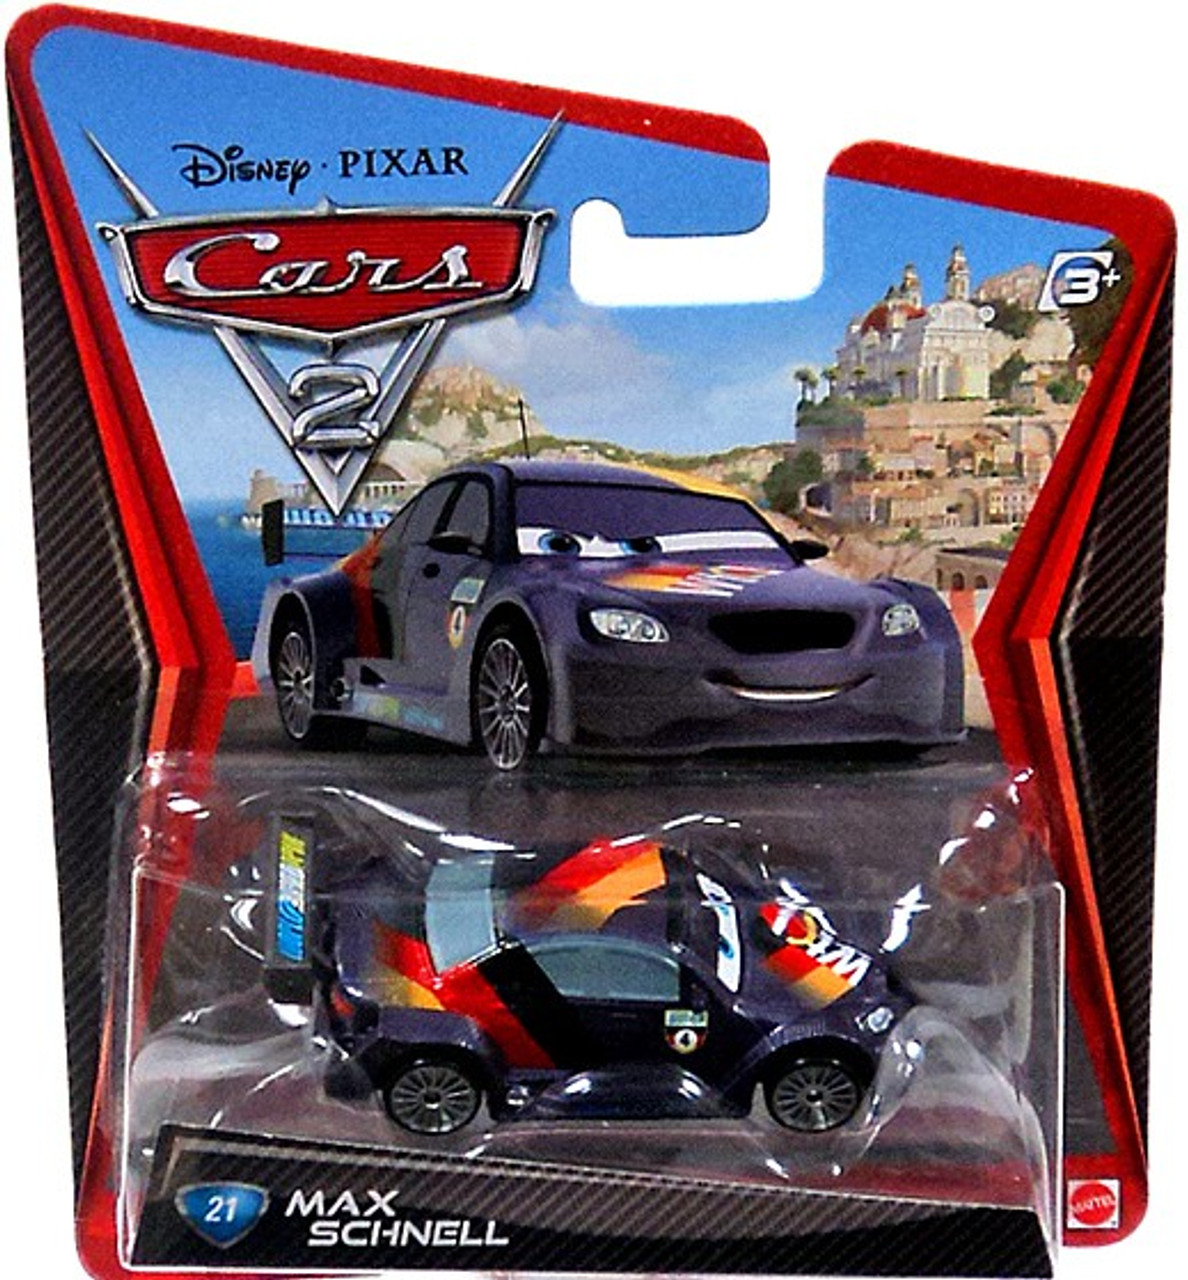 Disney Pixar Cars Cars 2 Main Series Max Schnell 155